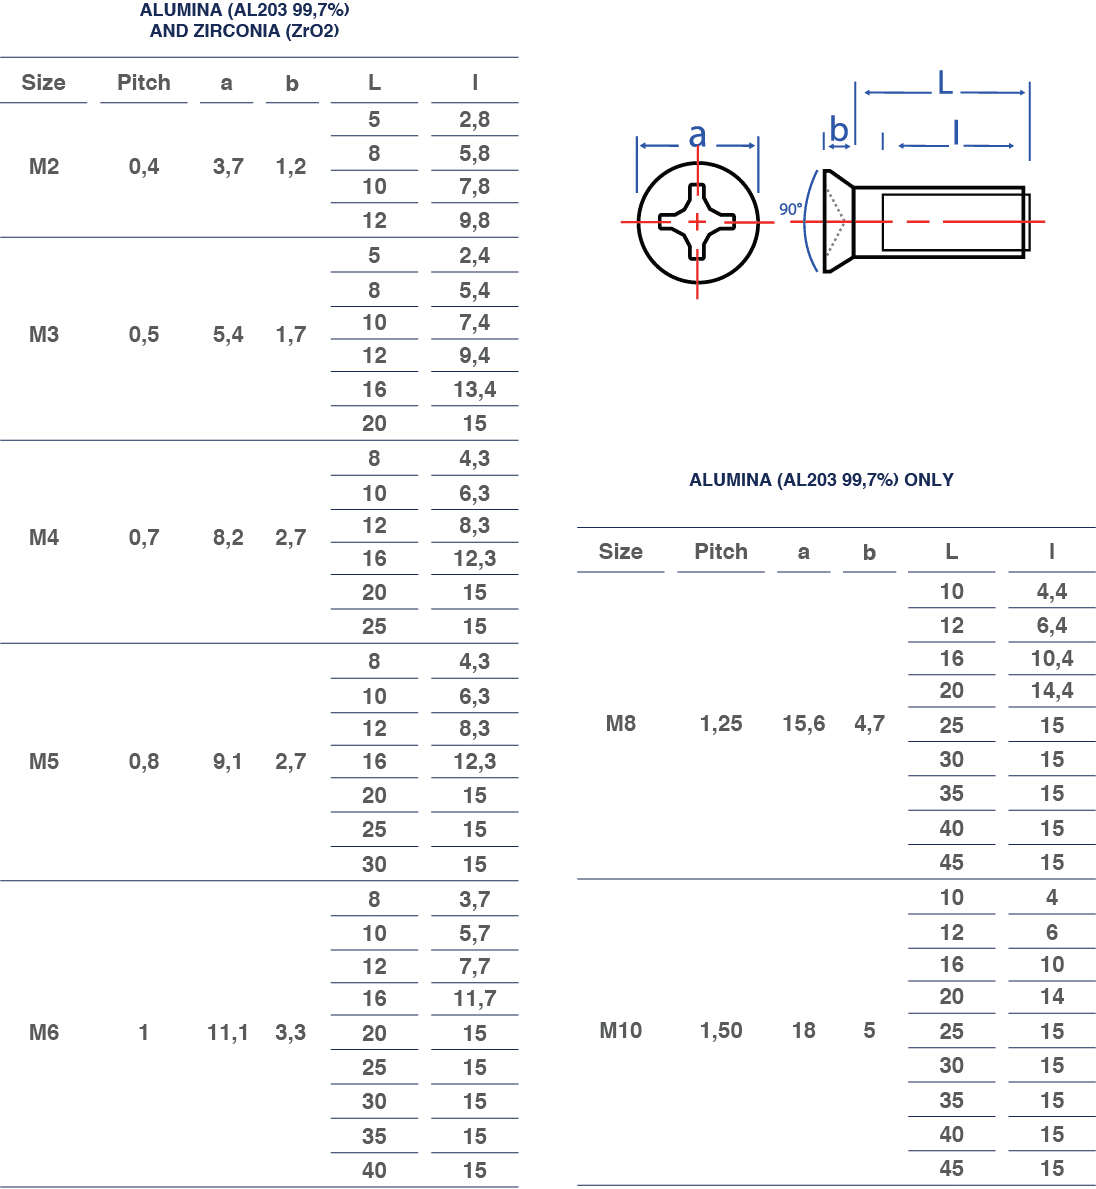 flat countersunk head dimensions